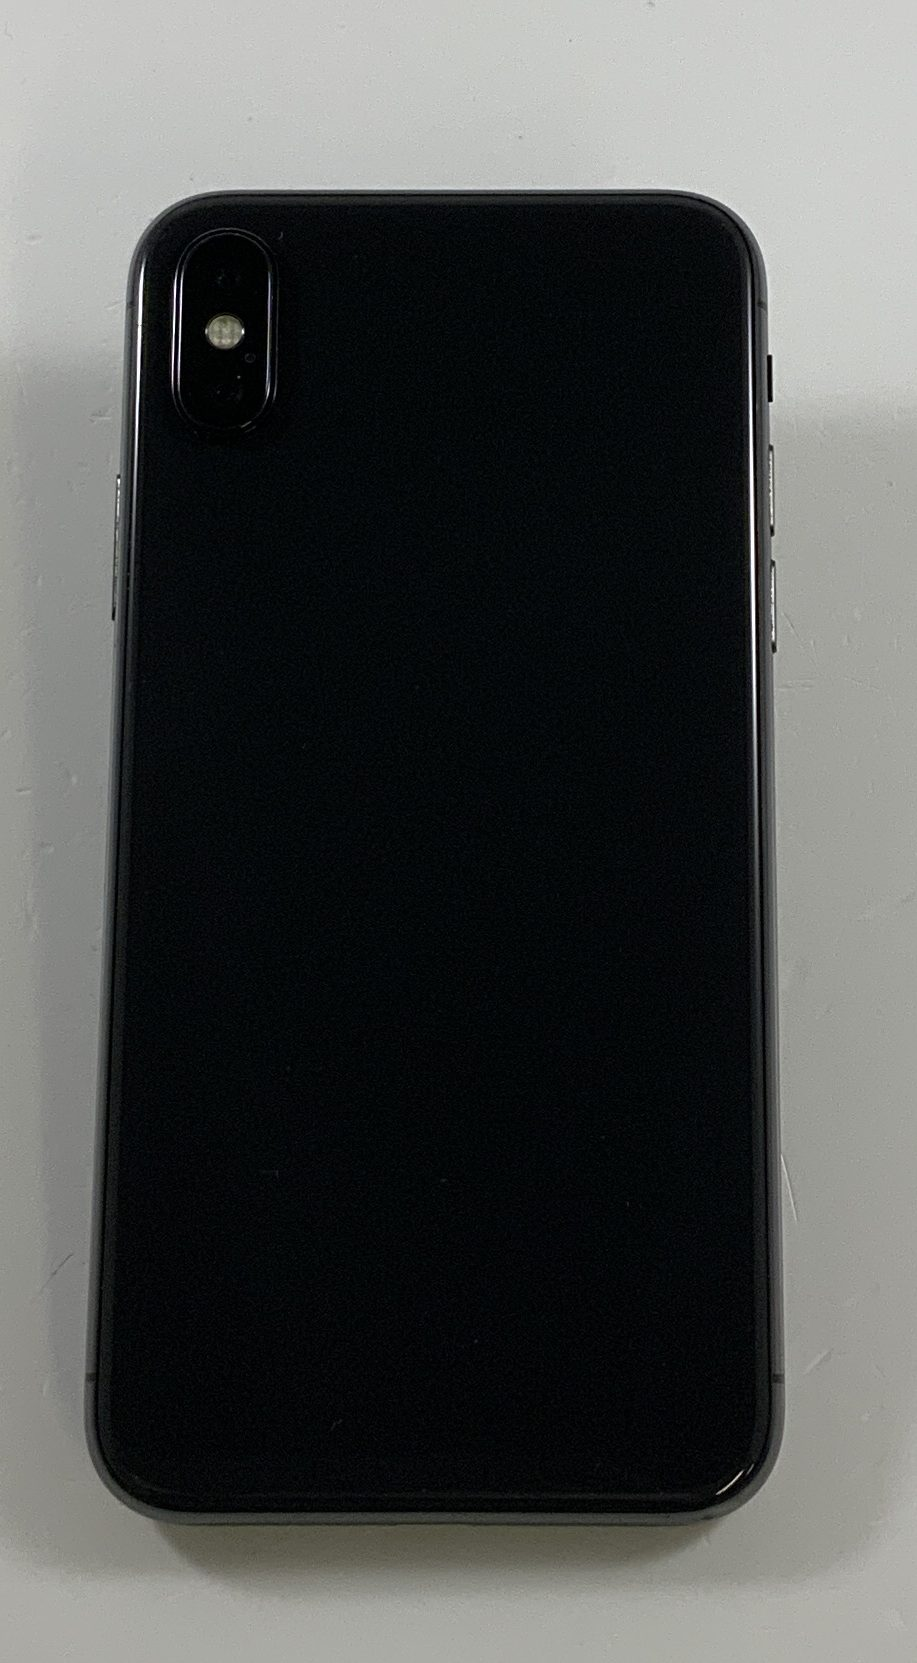 iPhone X 64GB, 64GB, Space Gray, immagine 4